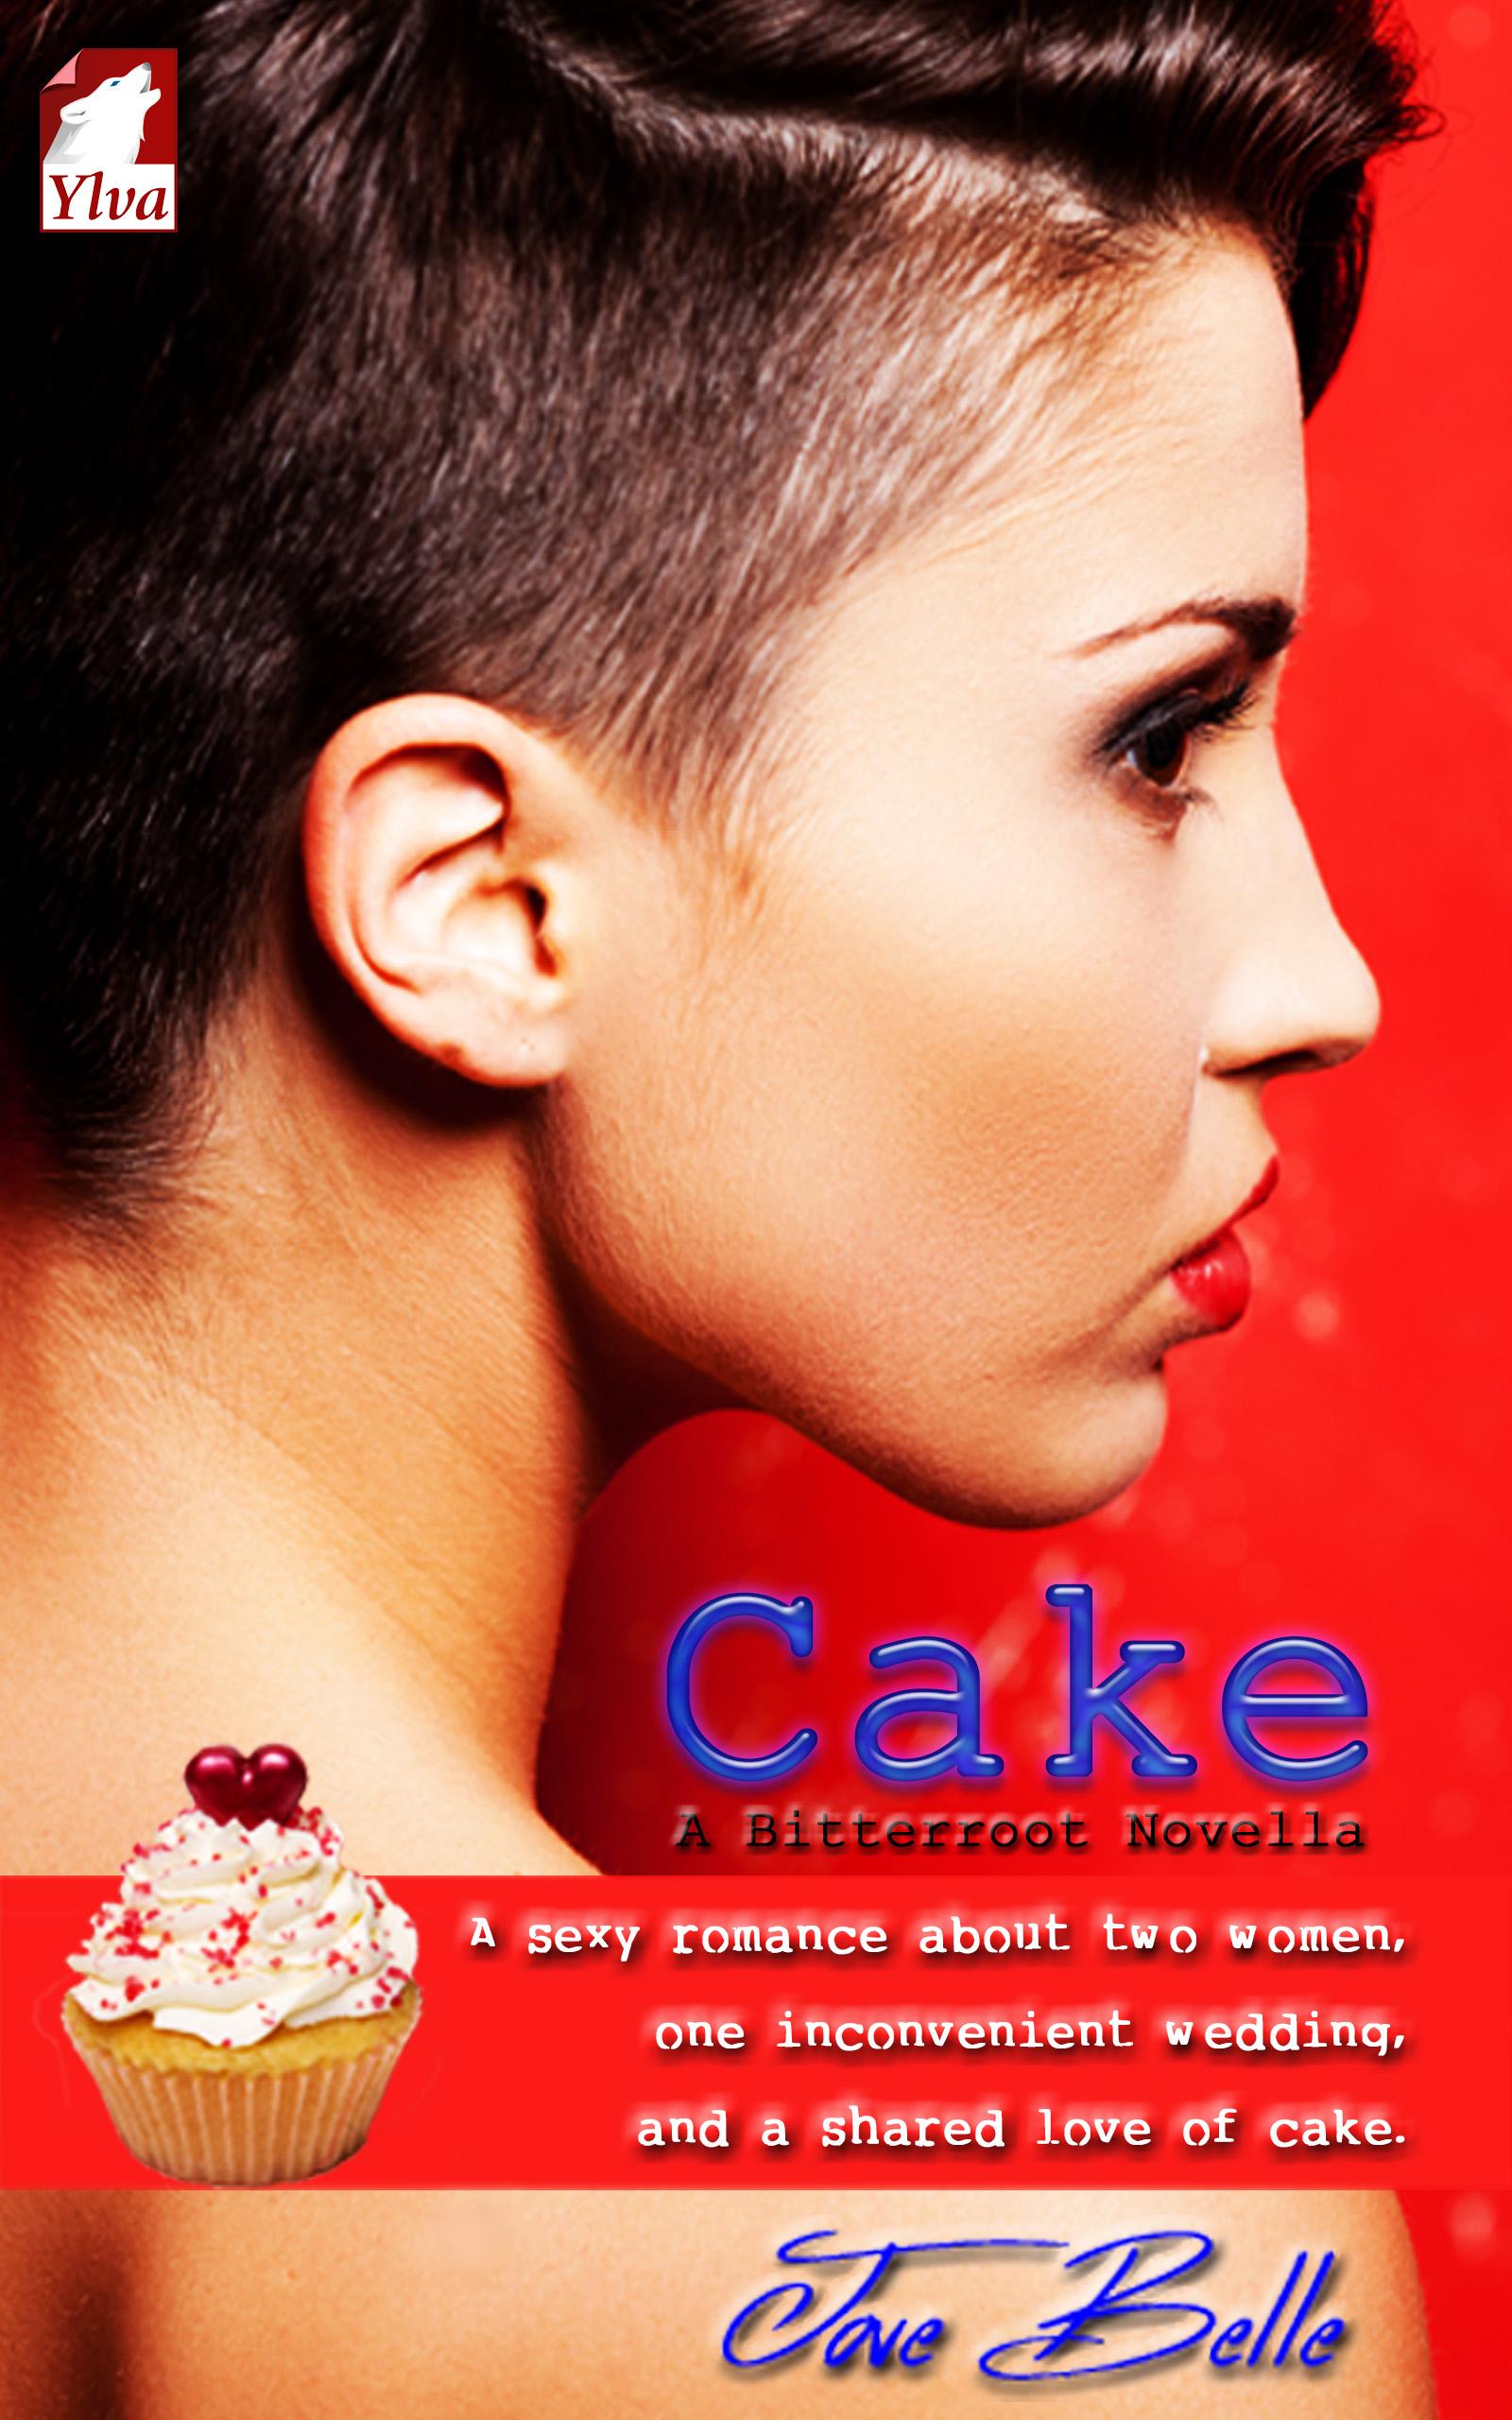 Cake1600x2560